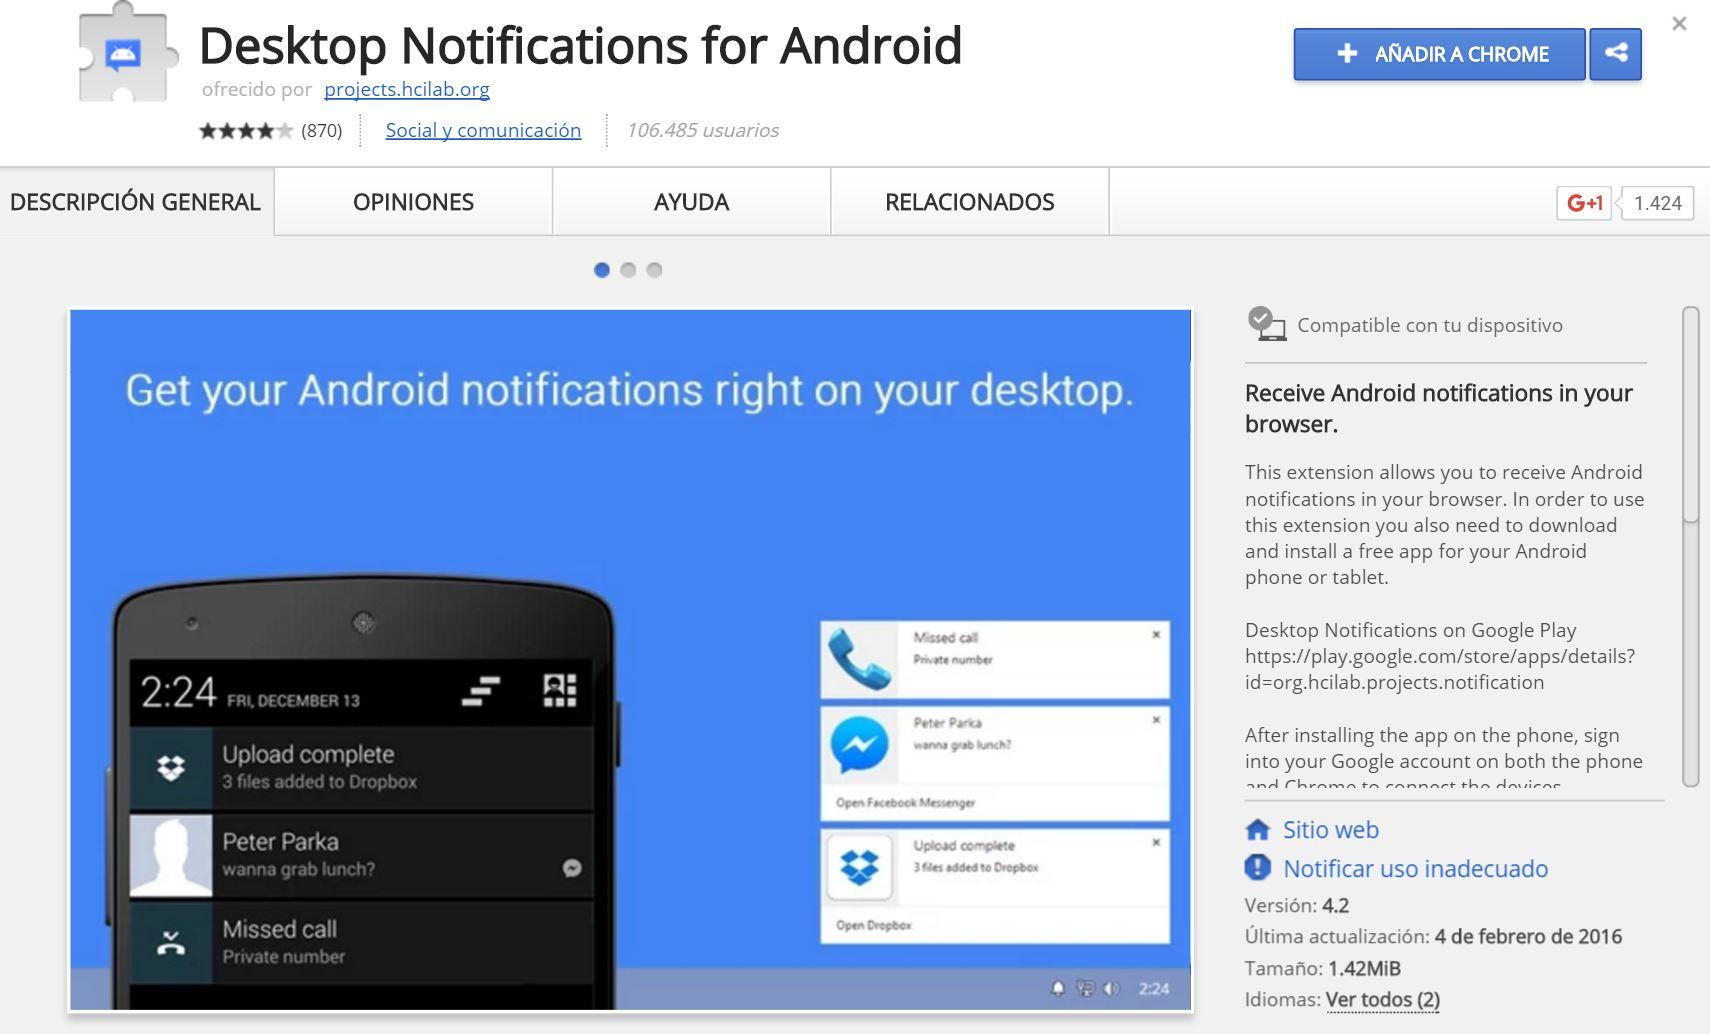 Extensión Desktop Notifications for Android